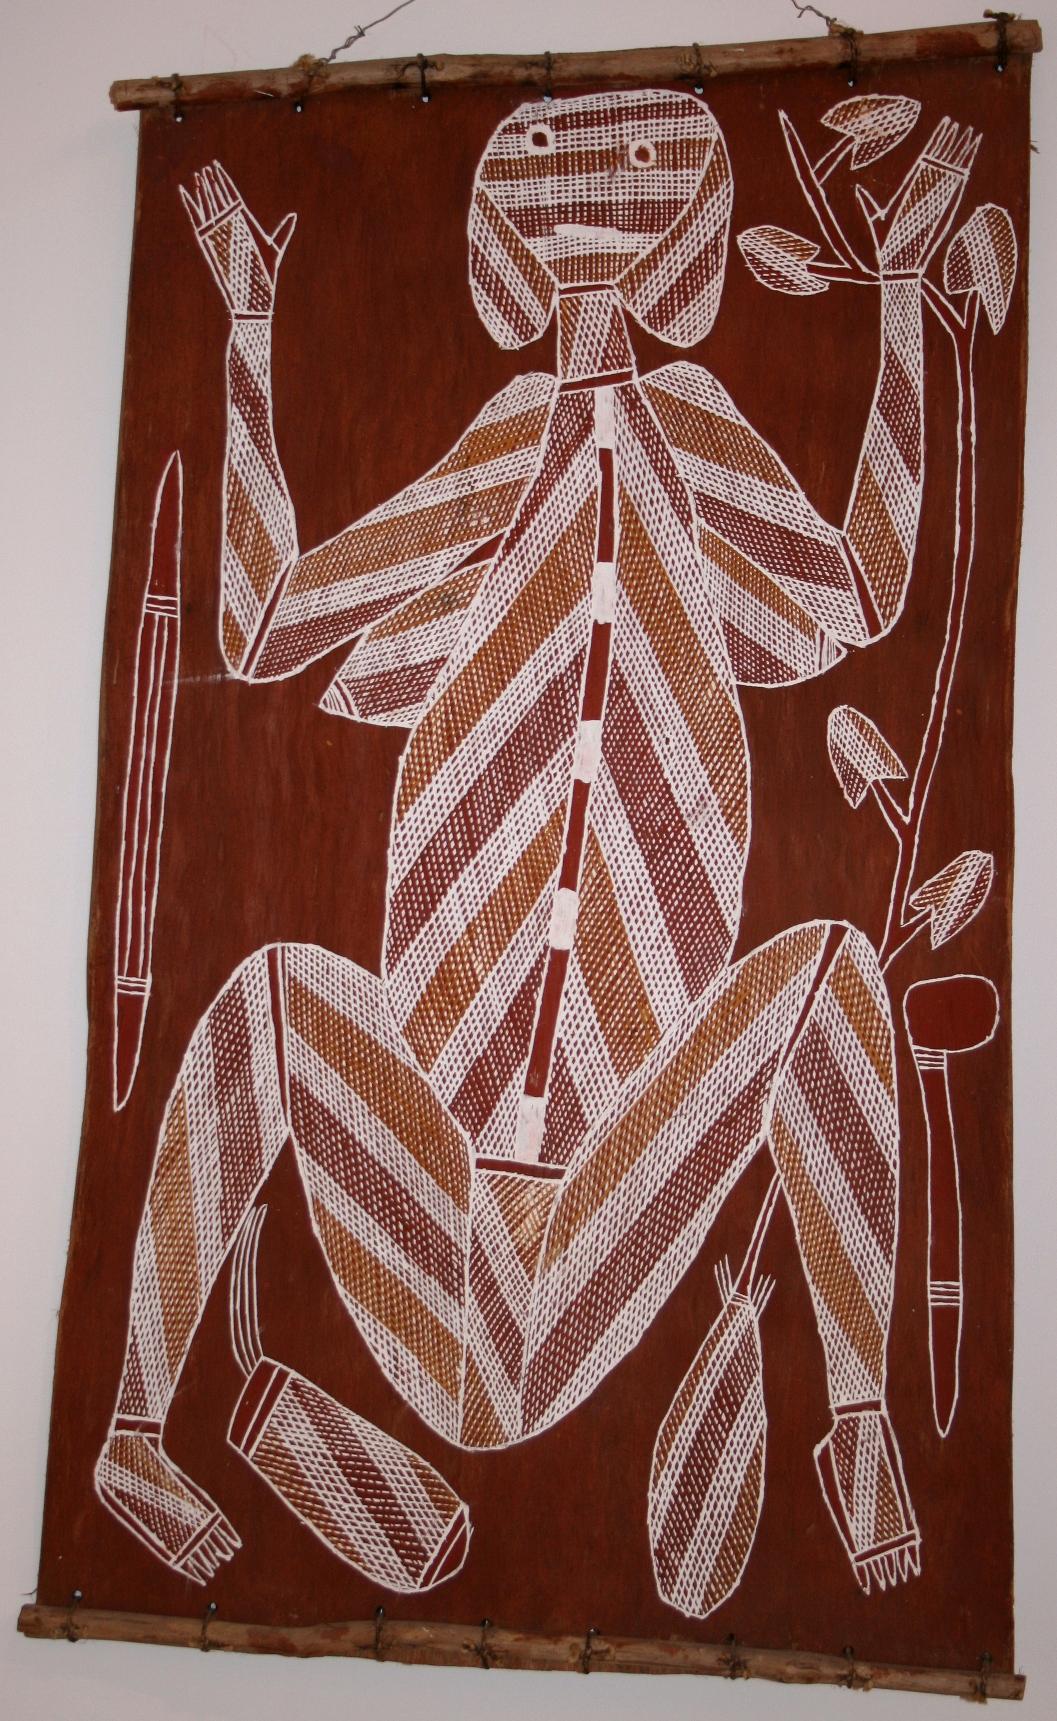 10-timmy kalarriya (49 x 88cm).jpg